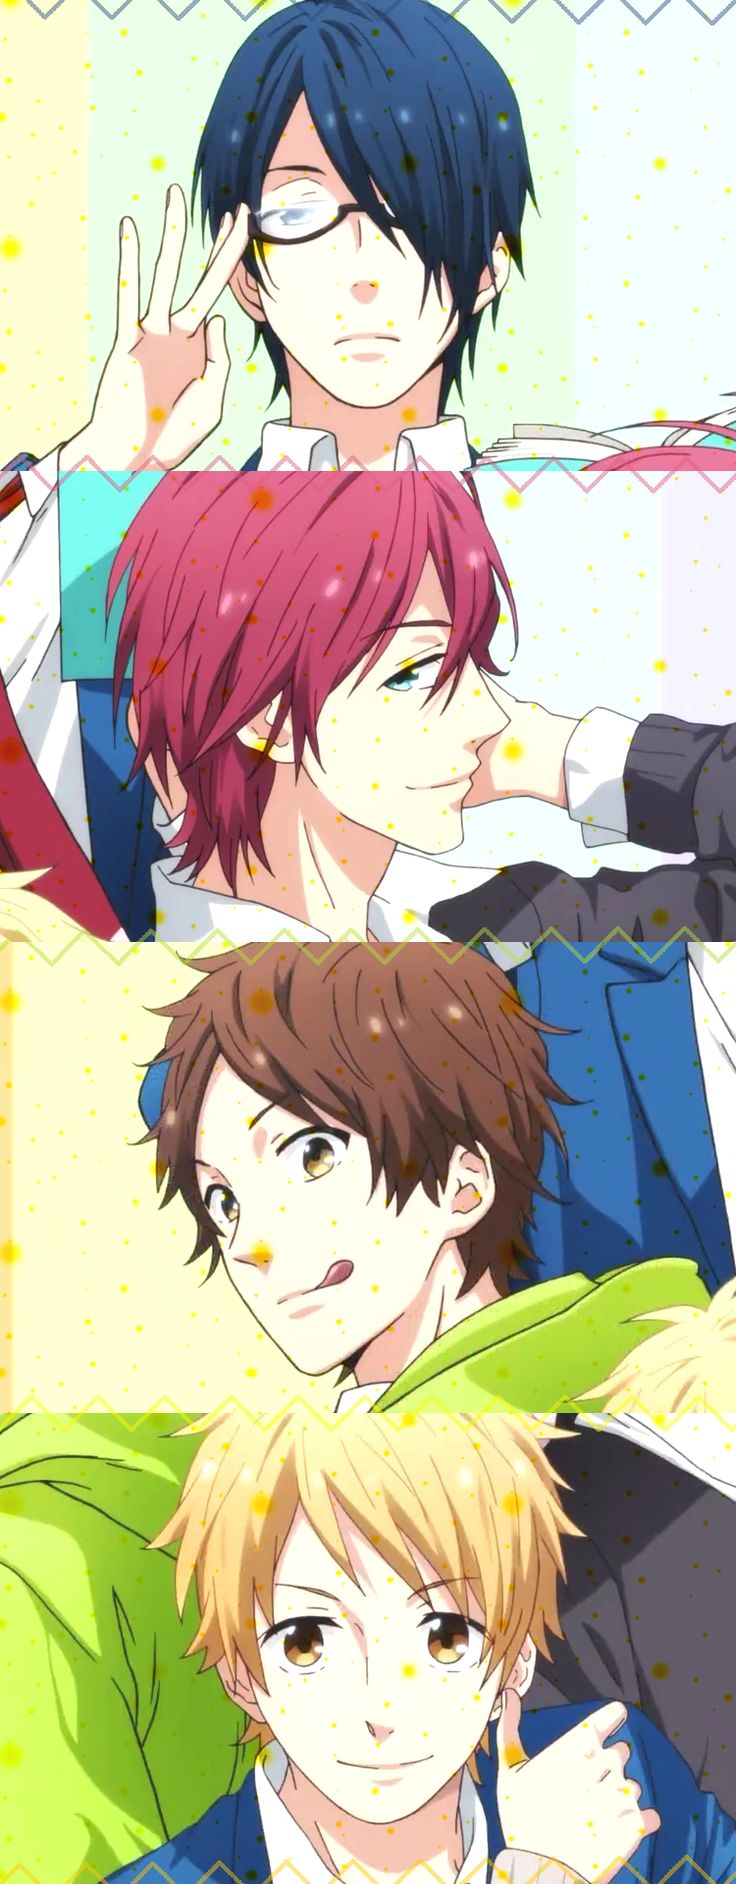 Niji iro days anime a nice show d anime romantic